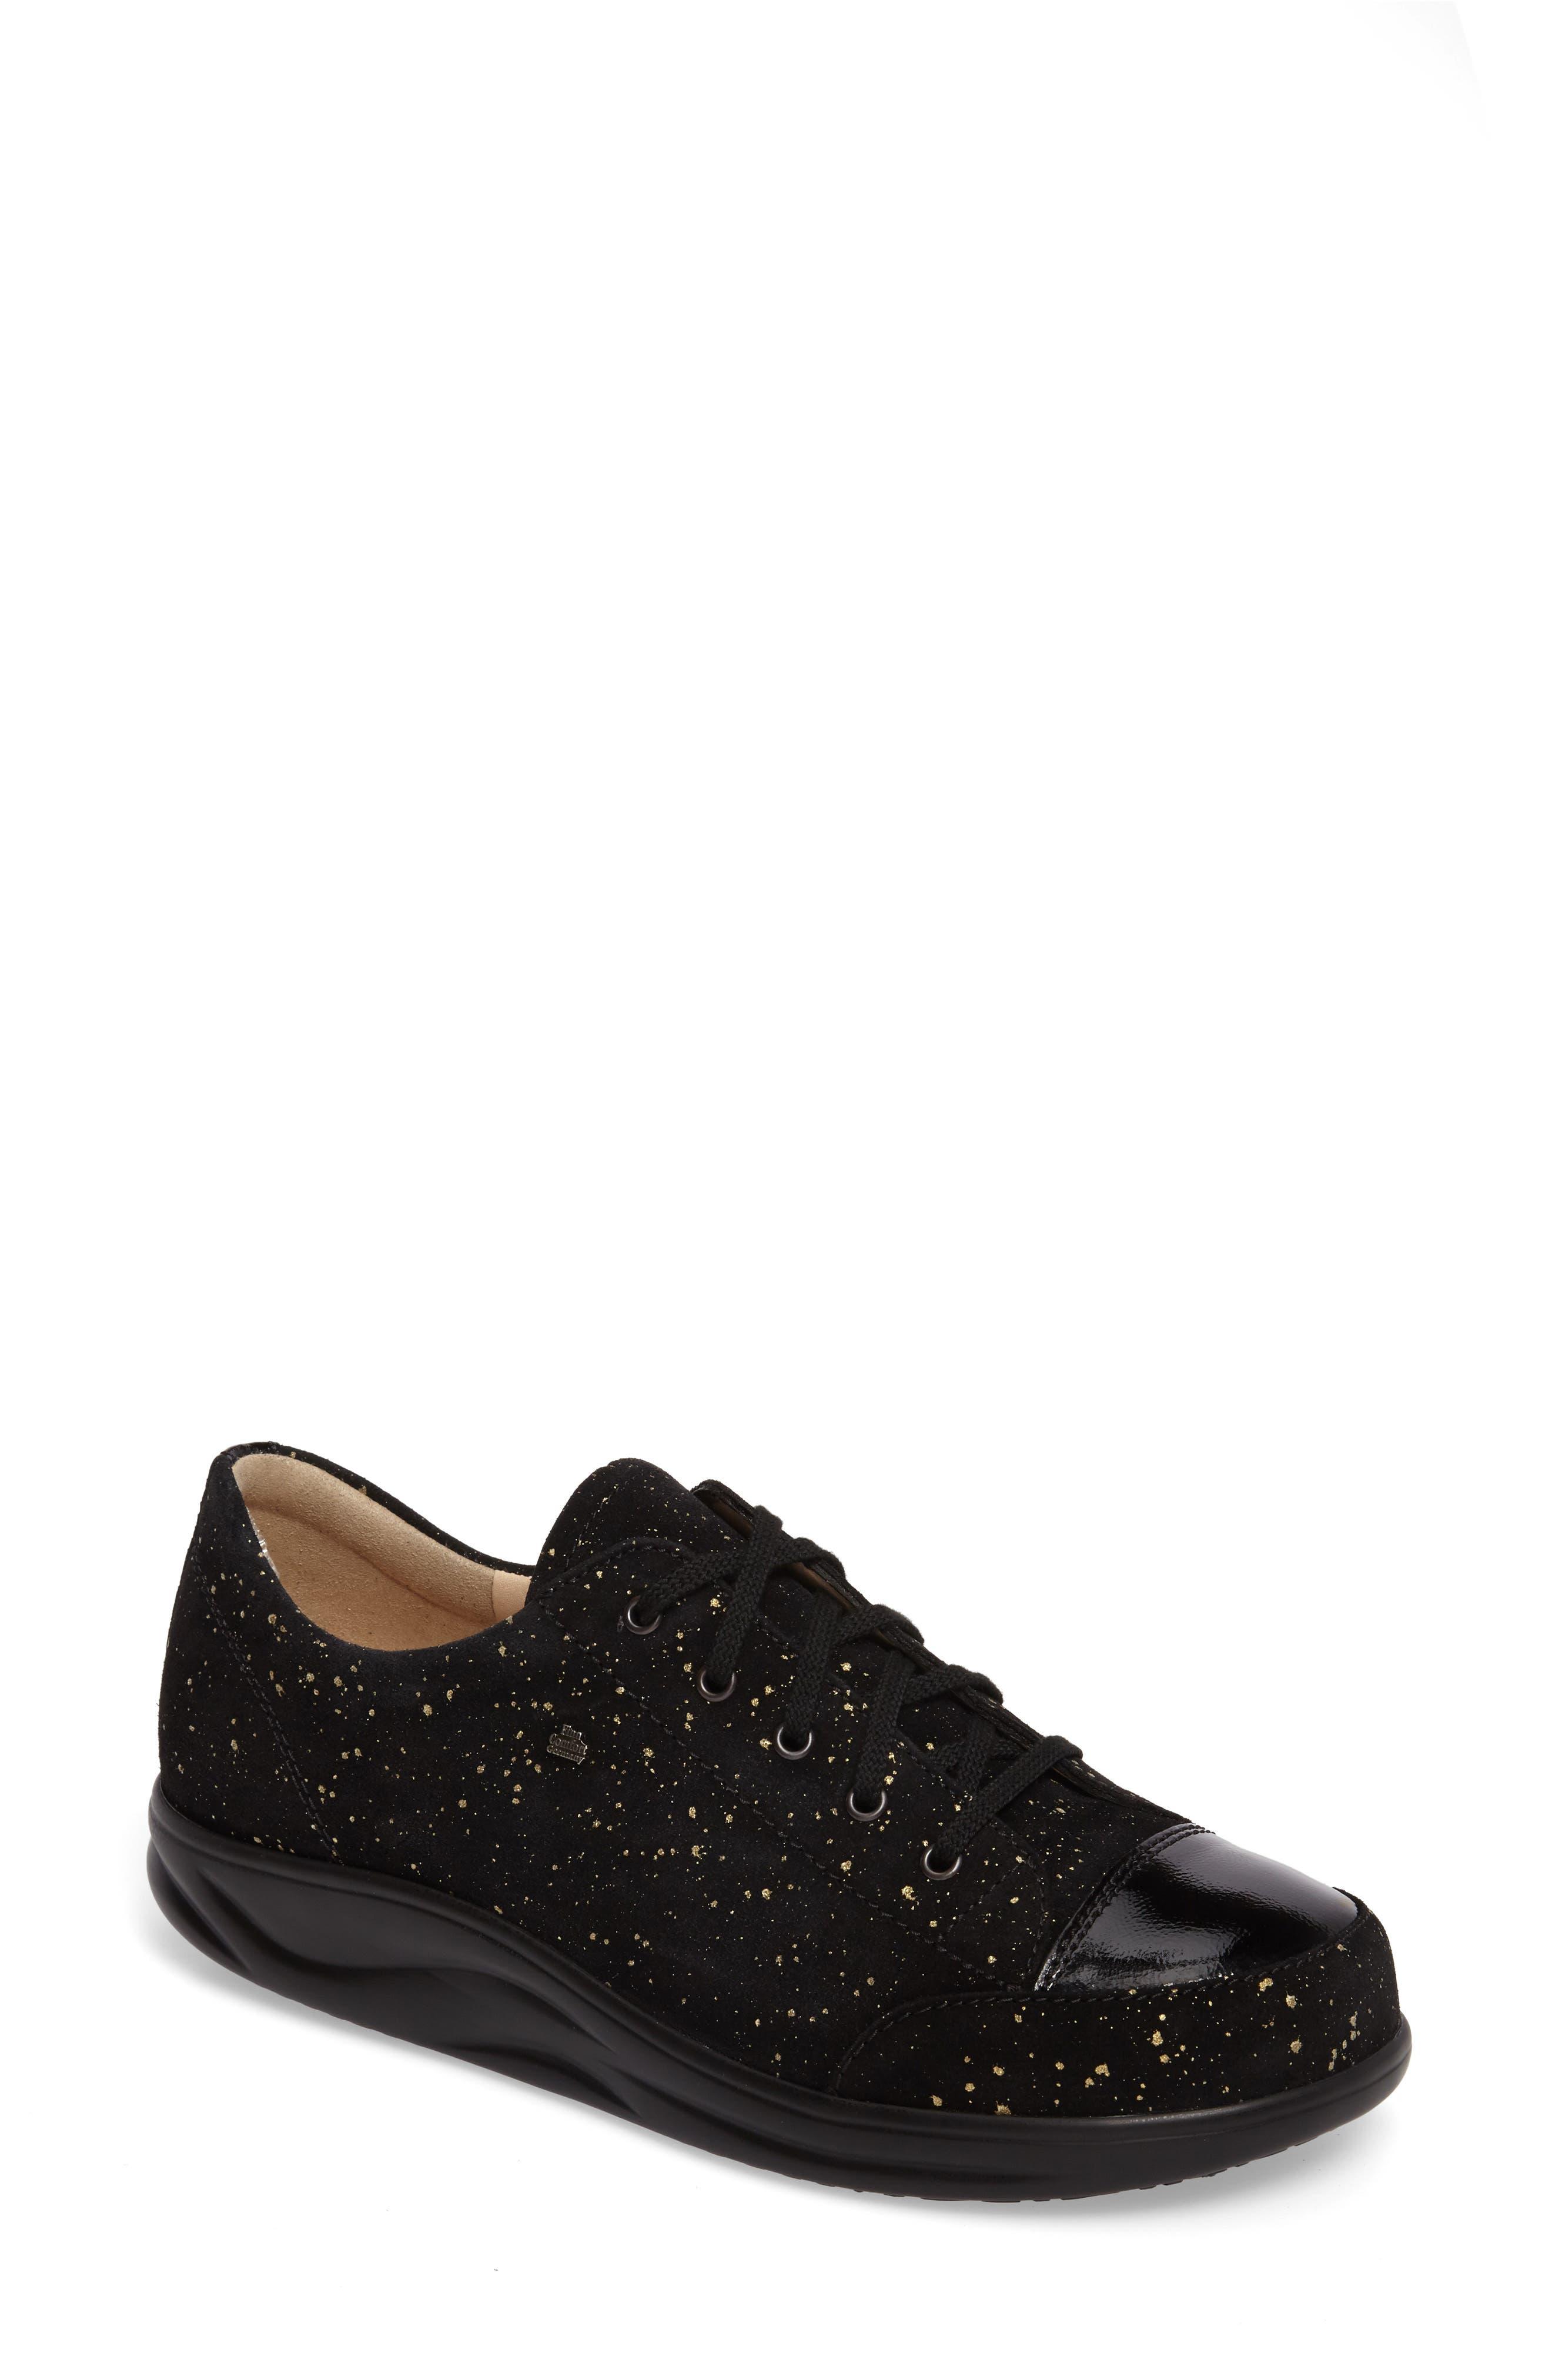 Womens Beige Sneakers Running Shoes Nordstrom Elaine Teal Top Leux Studio L